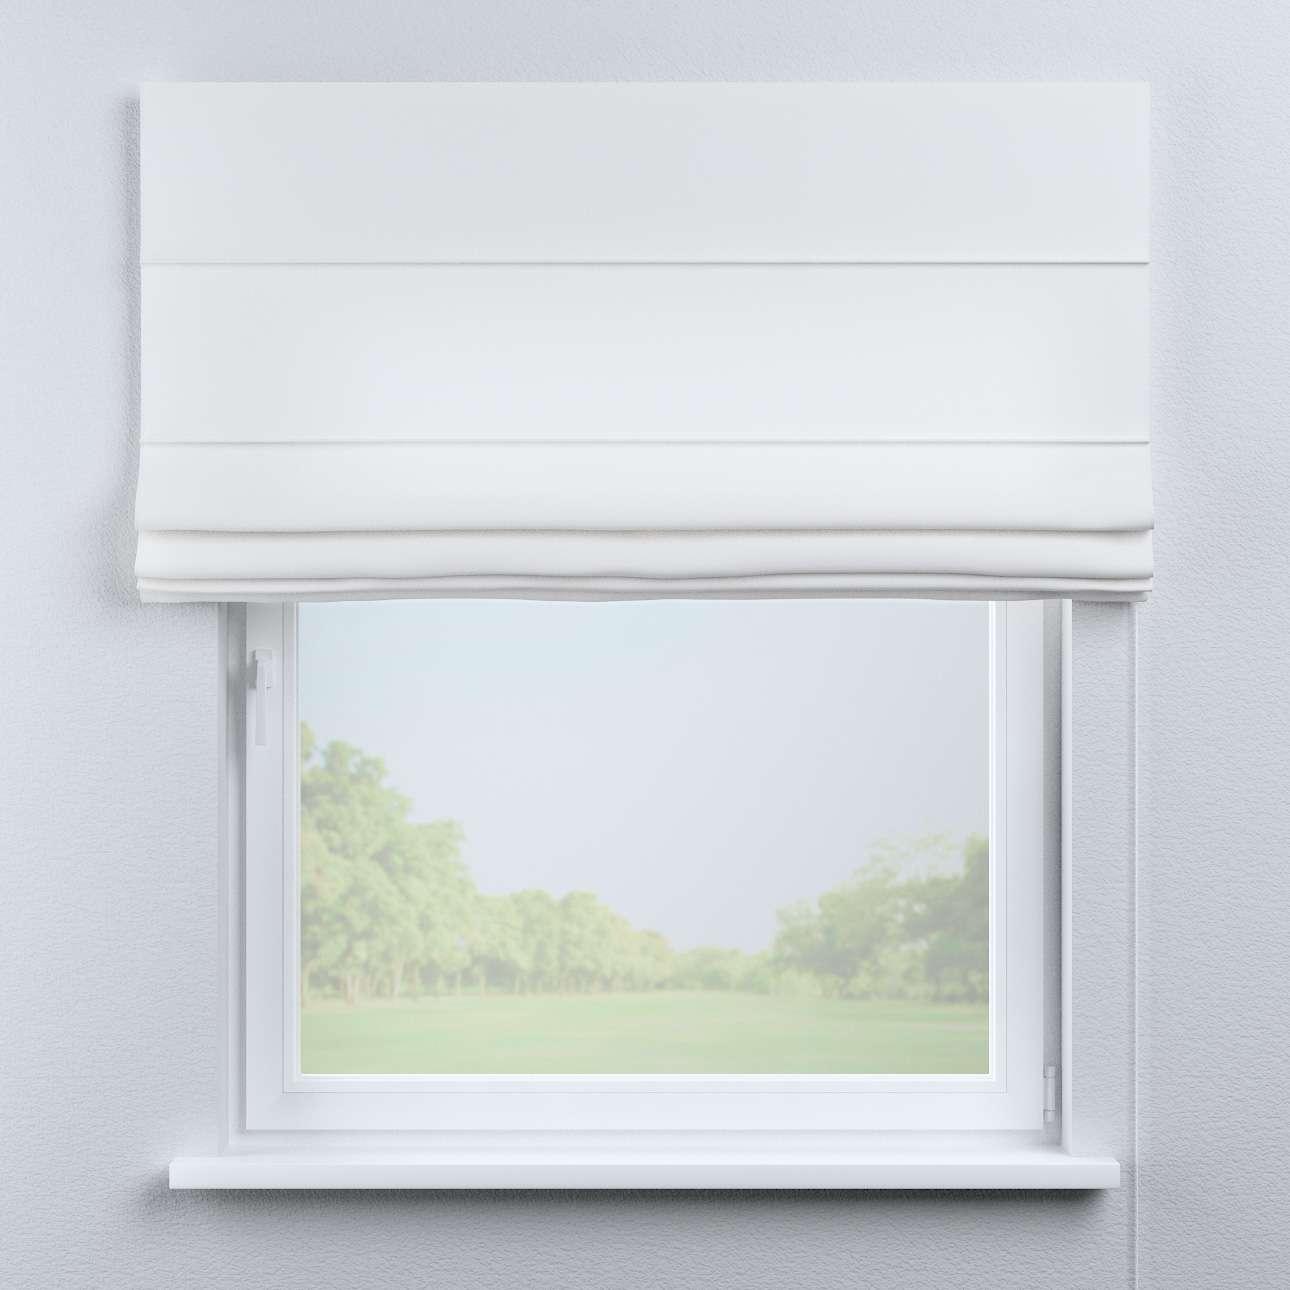 Romanetės Capri 80 x 170 cm (plotis x ilgis) kolekcijoje Loneta , audinys: 133-02